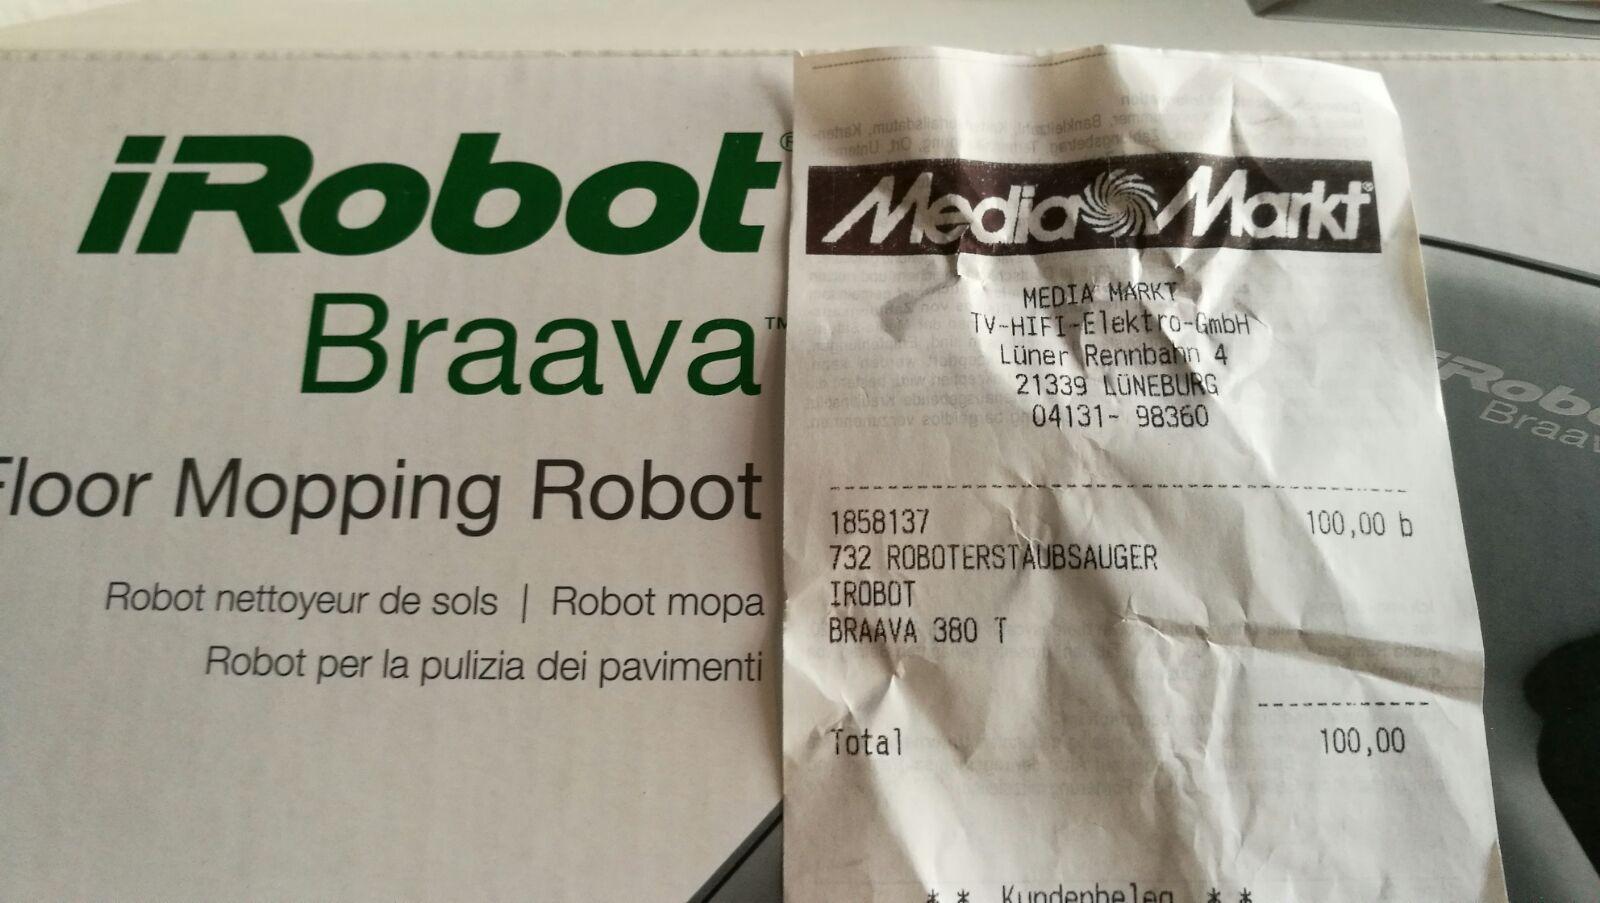 Media Markt Lüneburg: iRobot Braava 380t für 100€